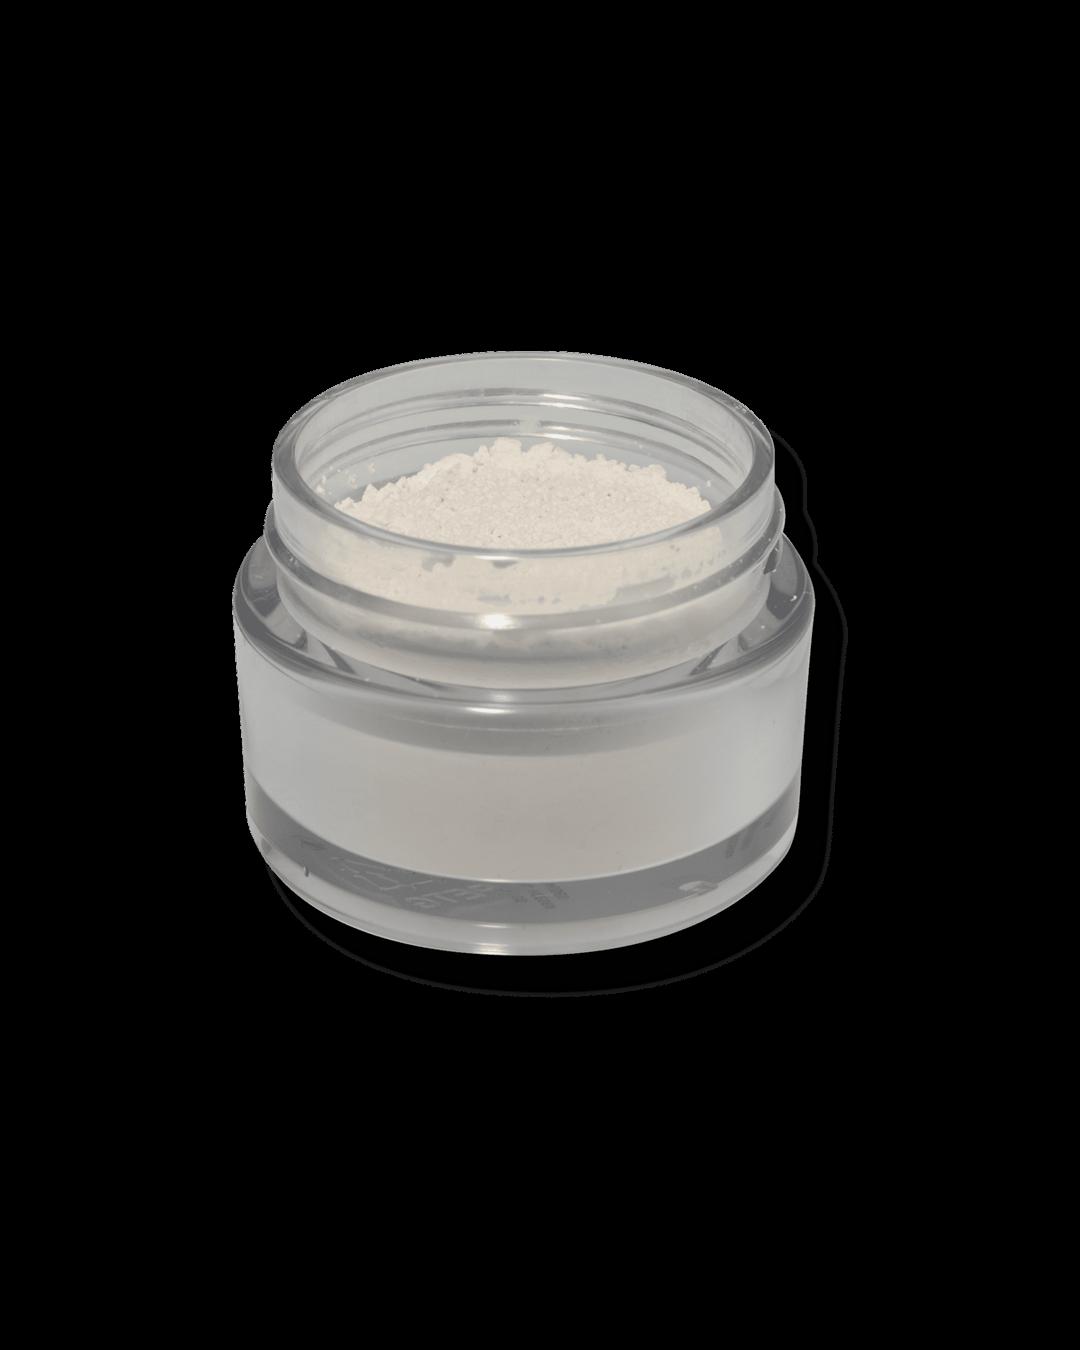 Silk finish powder